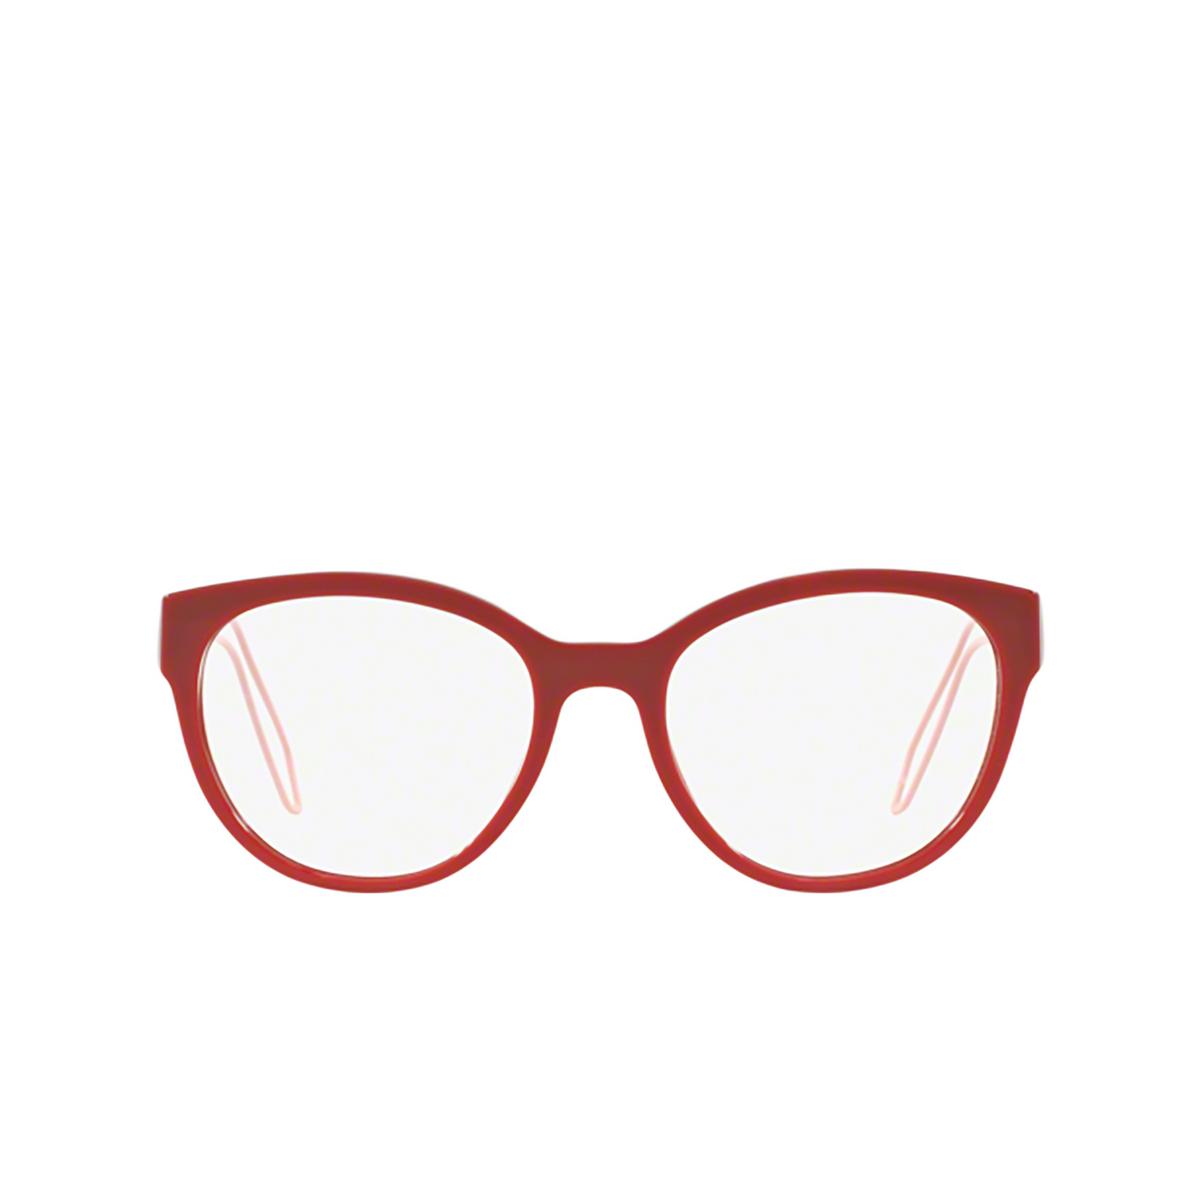 Miu Miu® Butterfly Eyeglasses: MU 03PV color Red USL1O1 - front view.